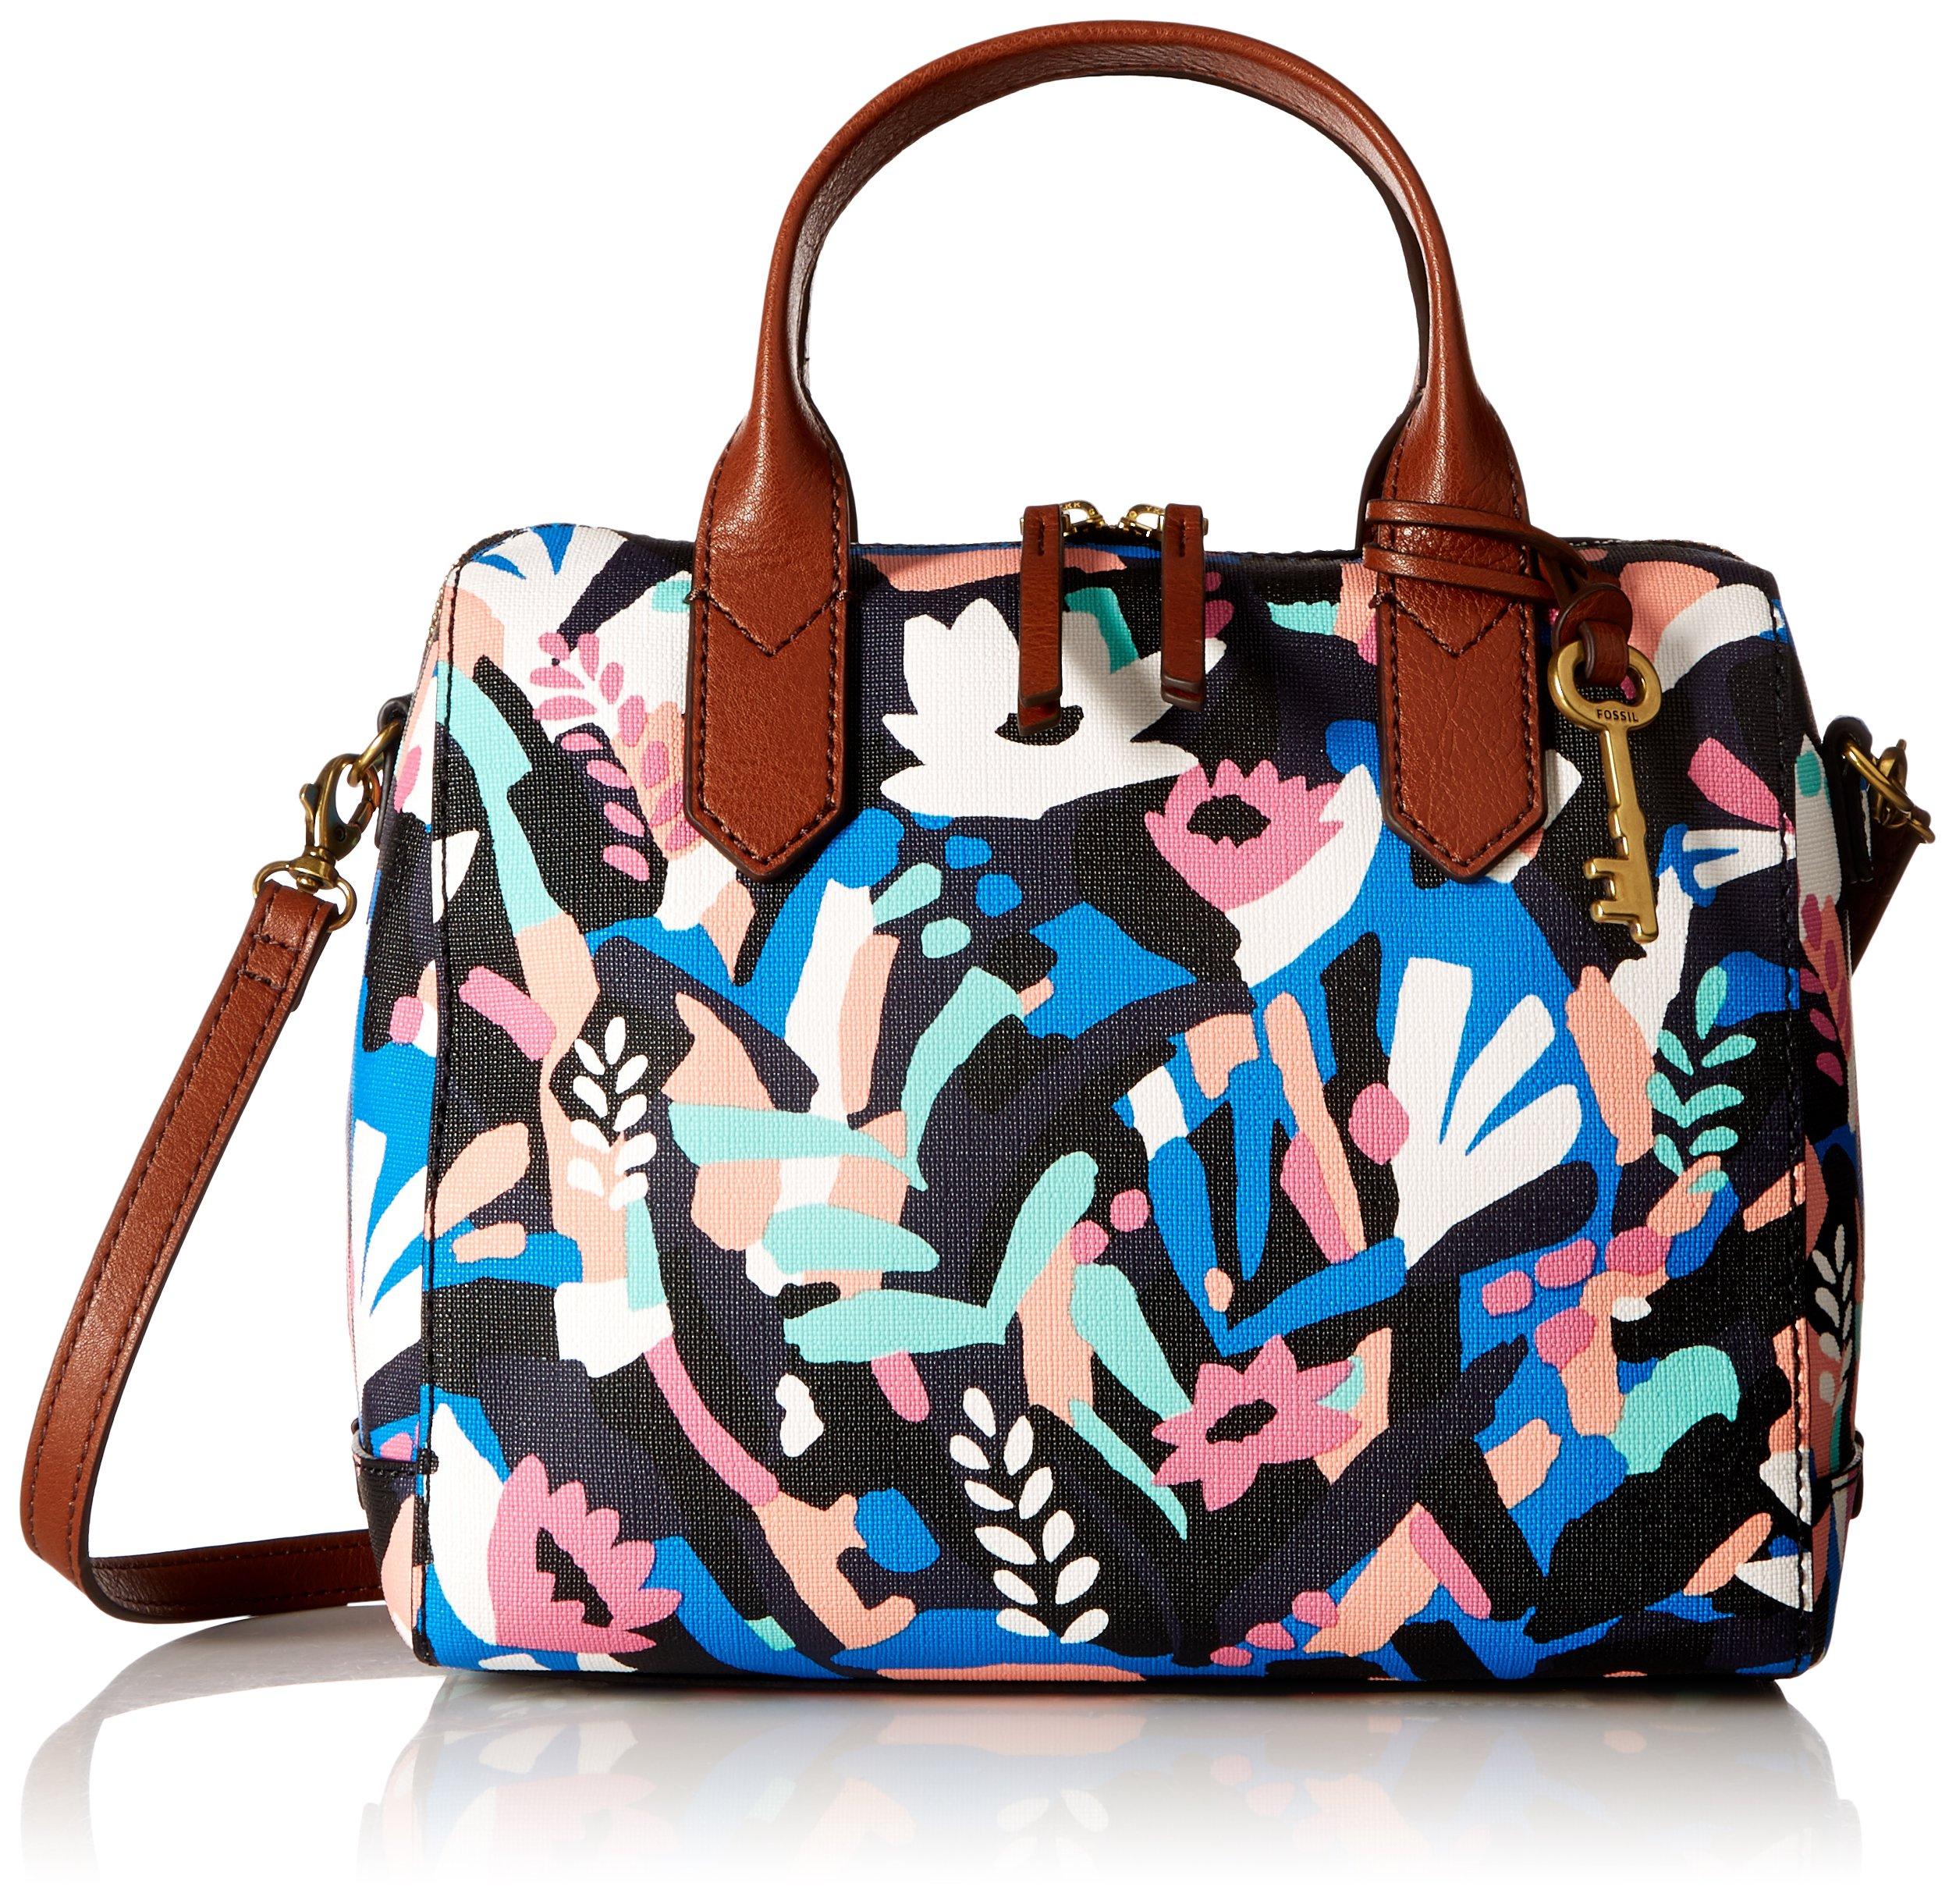 Fossil Fiona Satchel Handbag, Black Floral,One Size